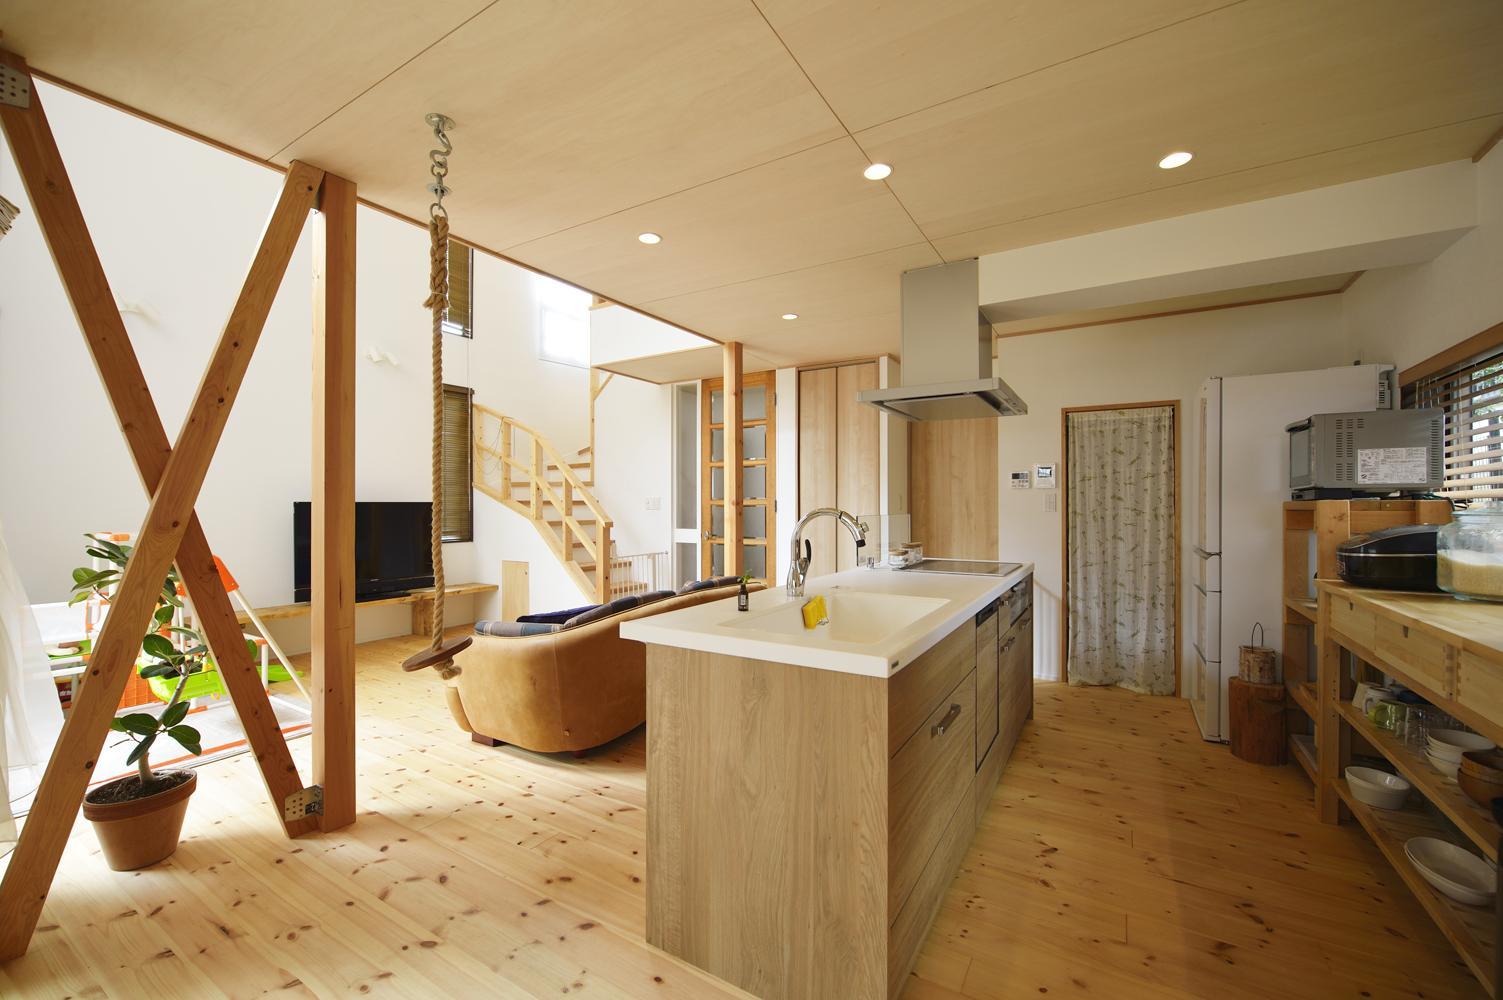 S邸・「解放感!」吹き抜けのある家の写真 アイランド型のオープンキッチン